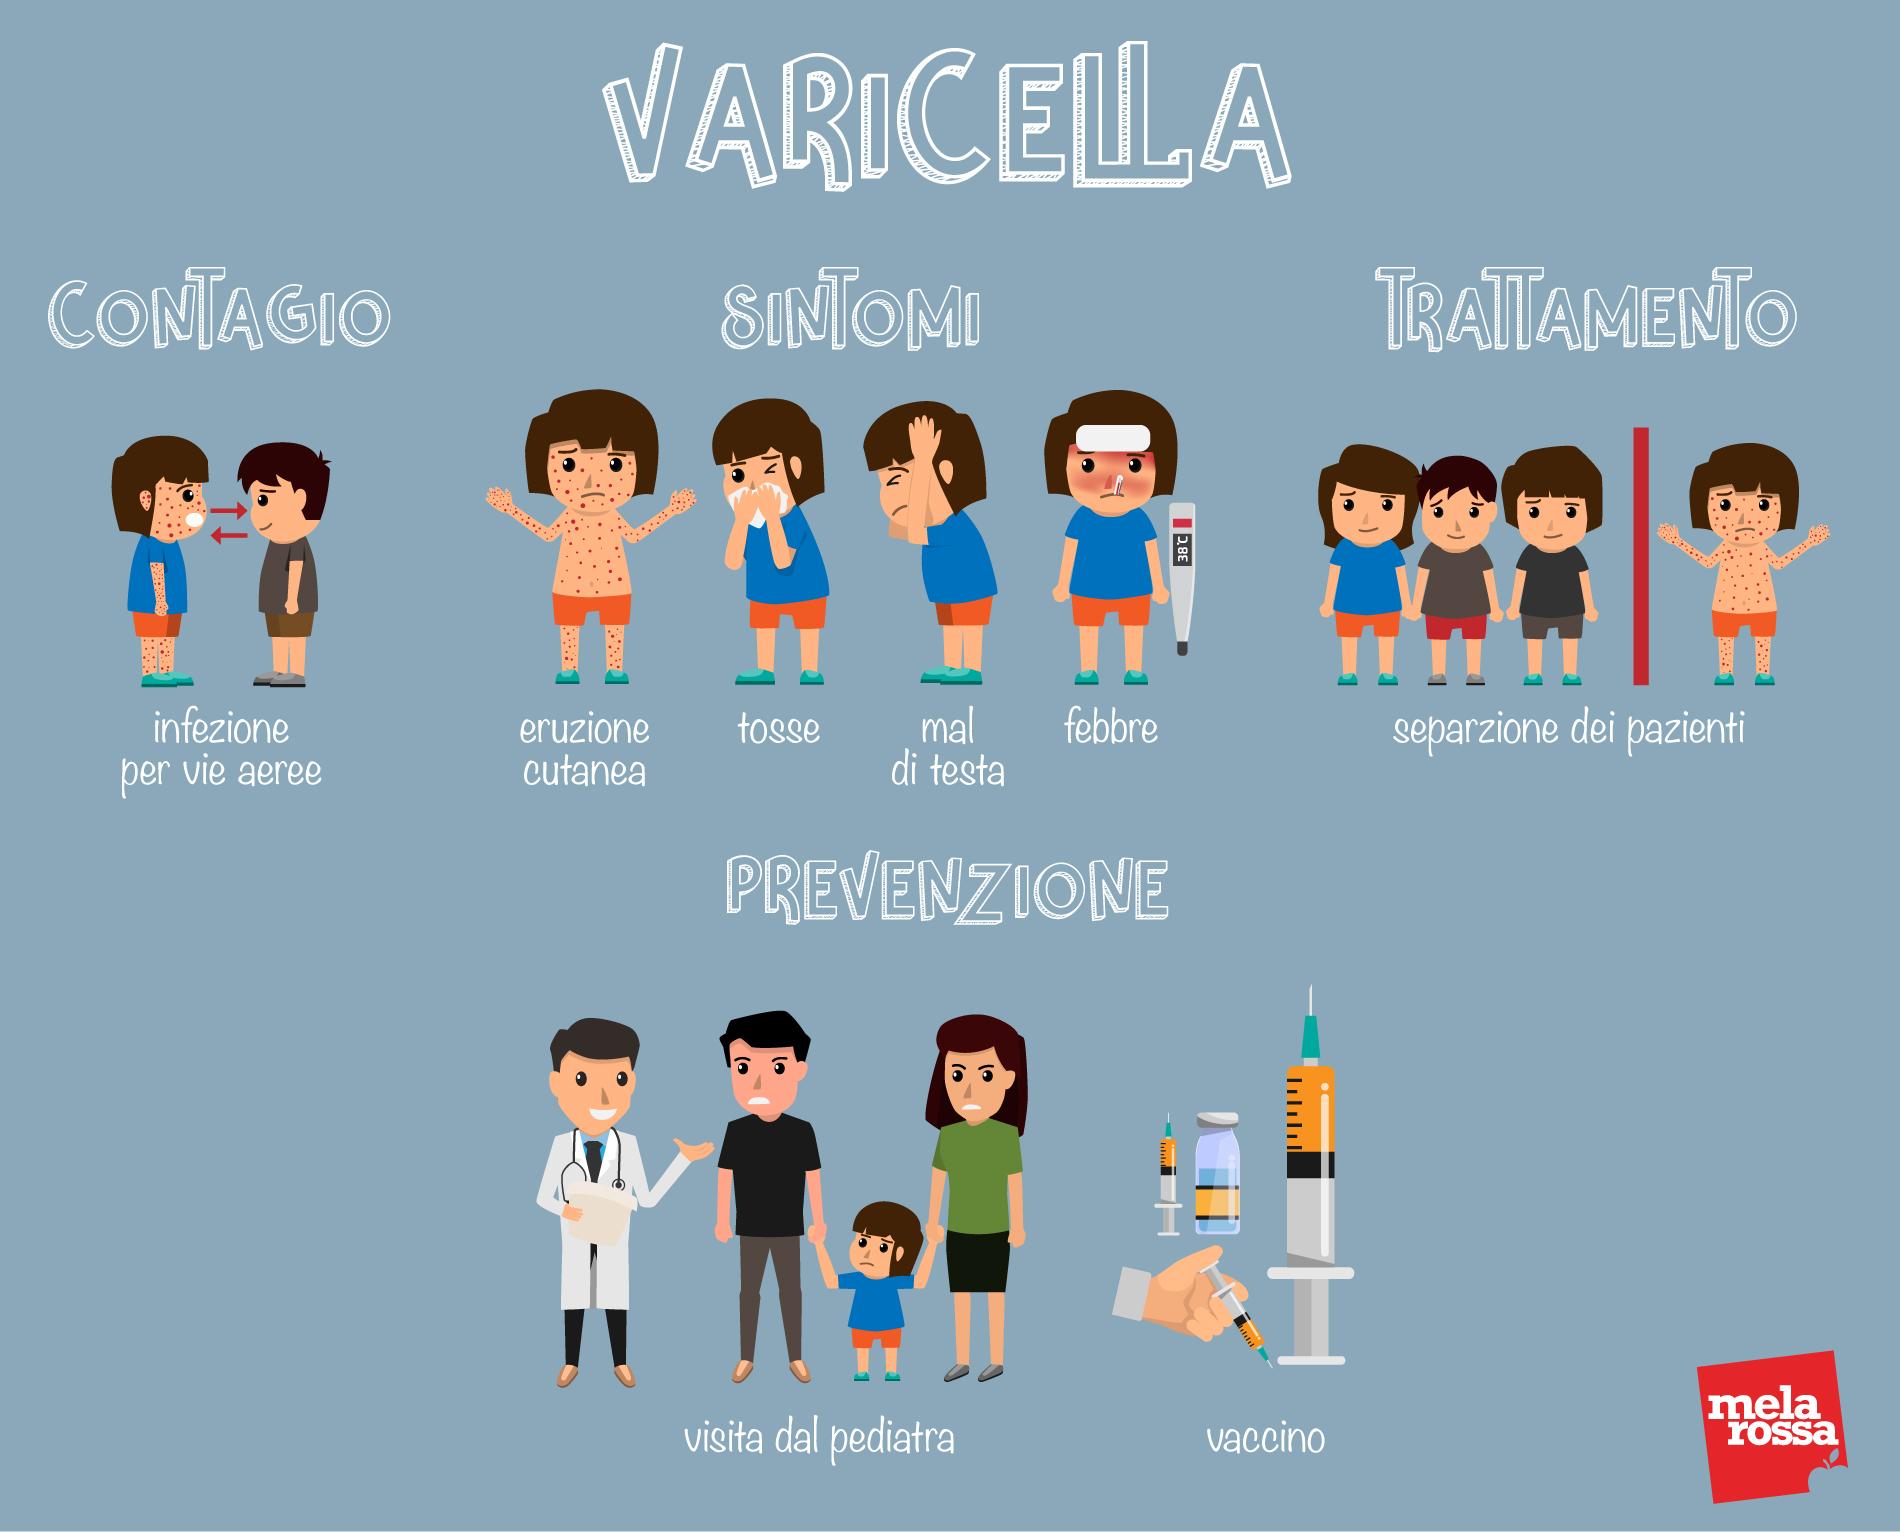 varicella: sintomi e contagio